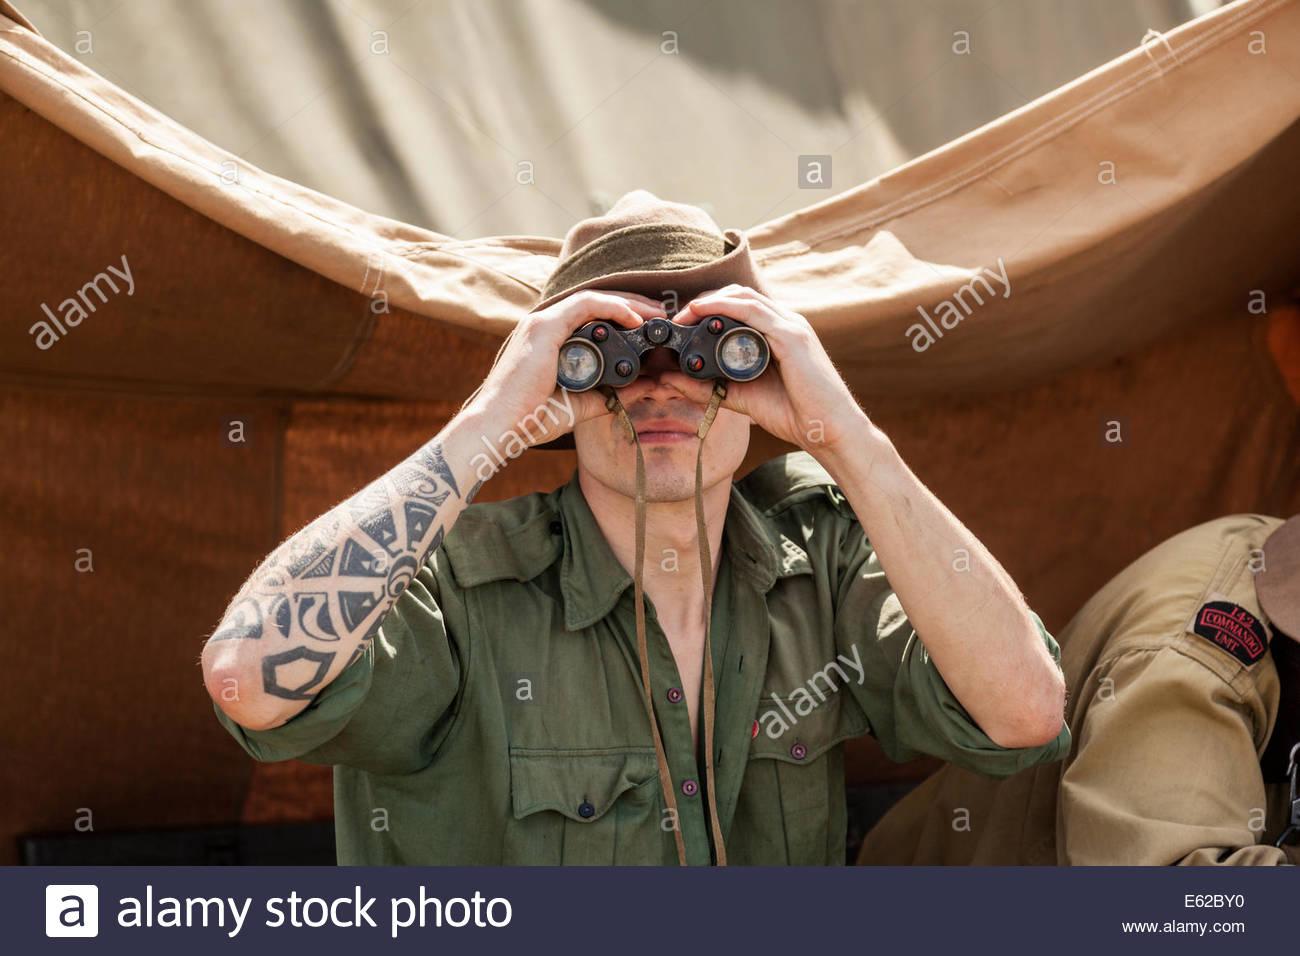 WW2 Re-enactment - Chindit Soldier looking through binoculars - Stock Image